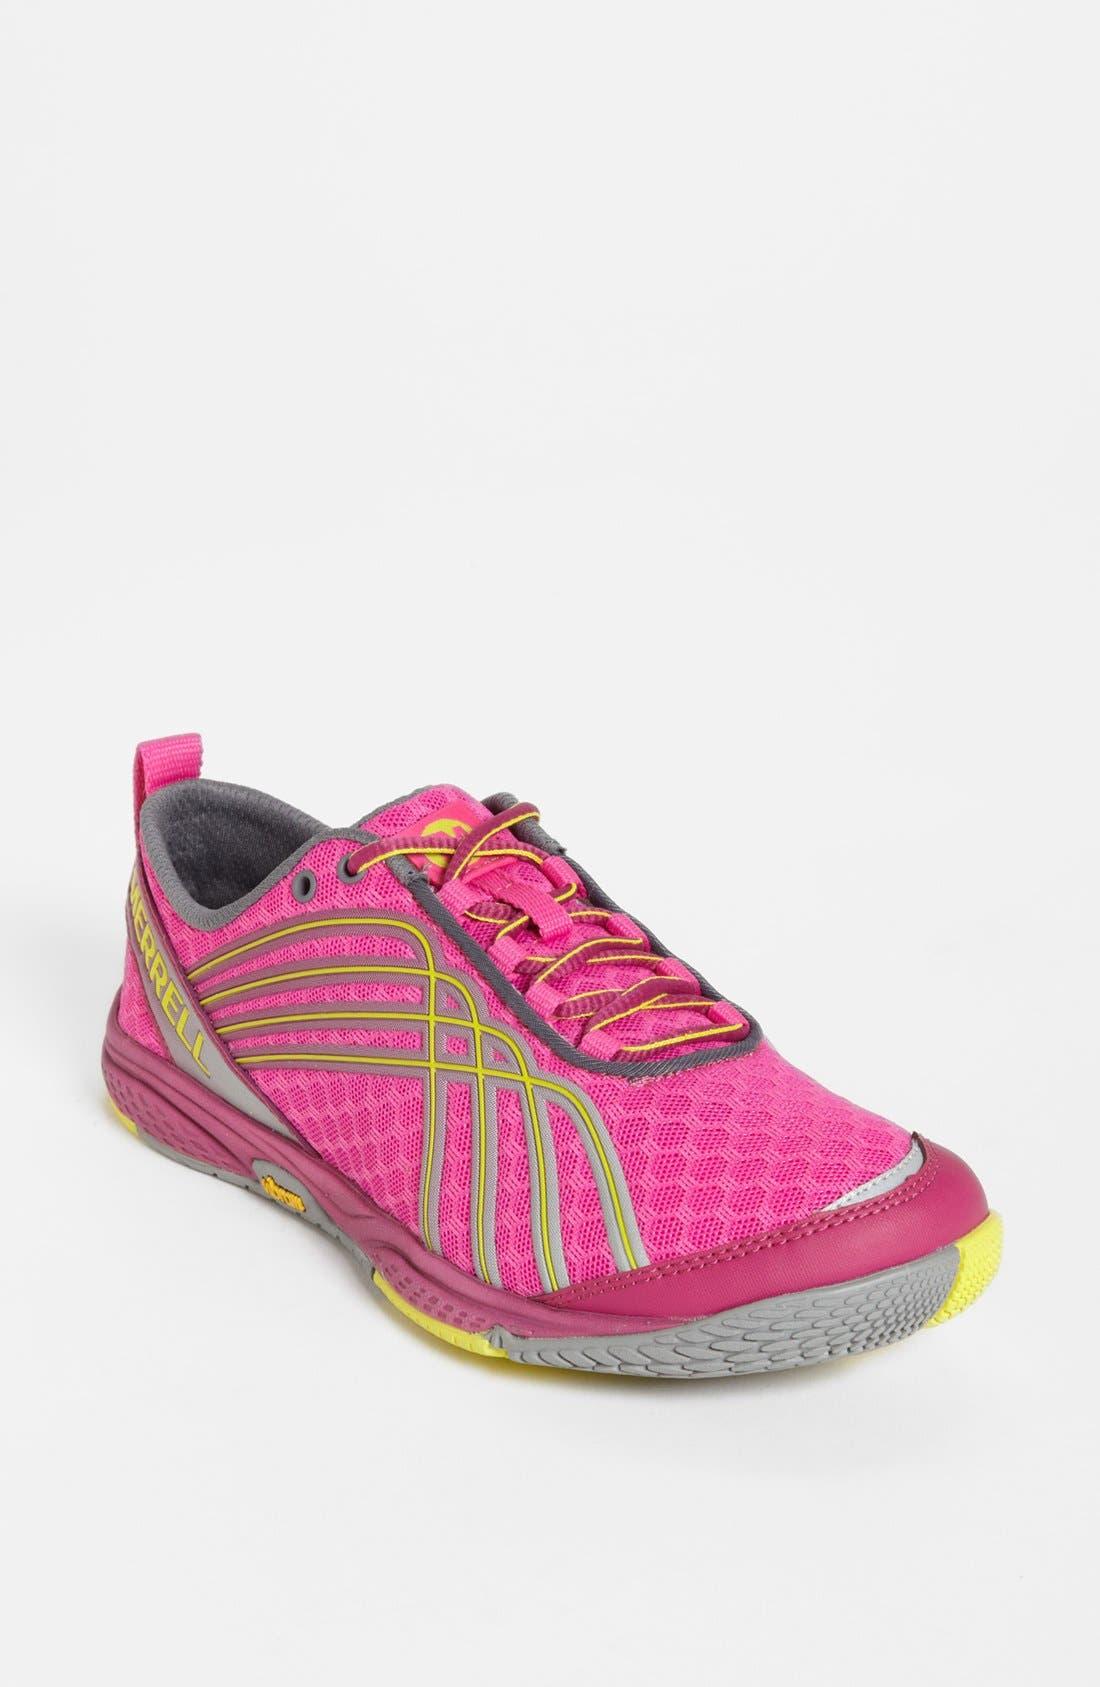 Alternate Image 1 Selected - Merrell 'Road Glove Dash 2' Lightweight Running Shoe